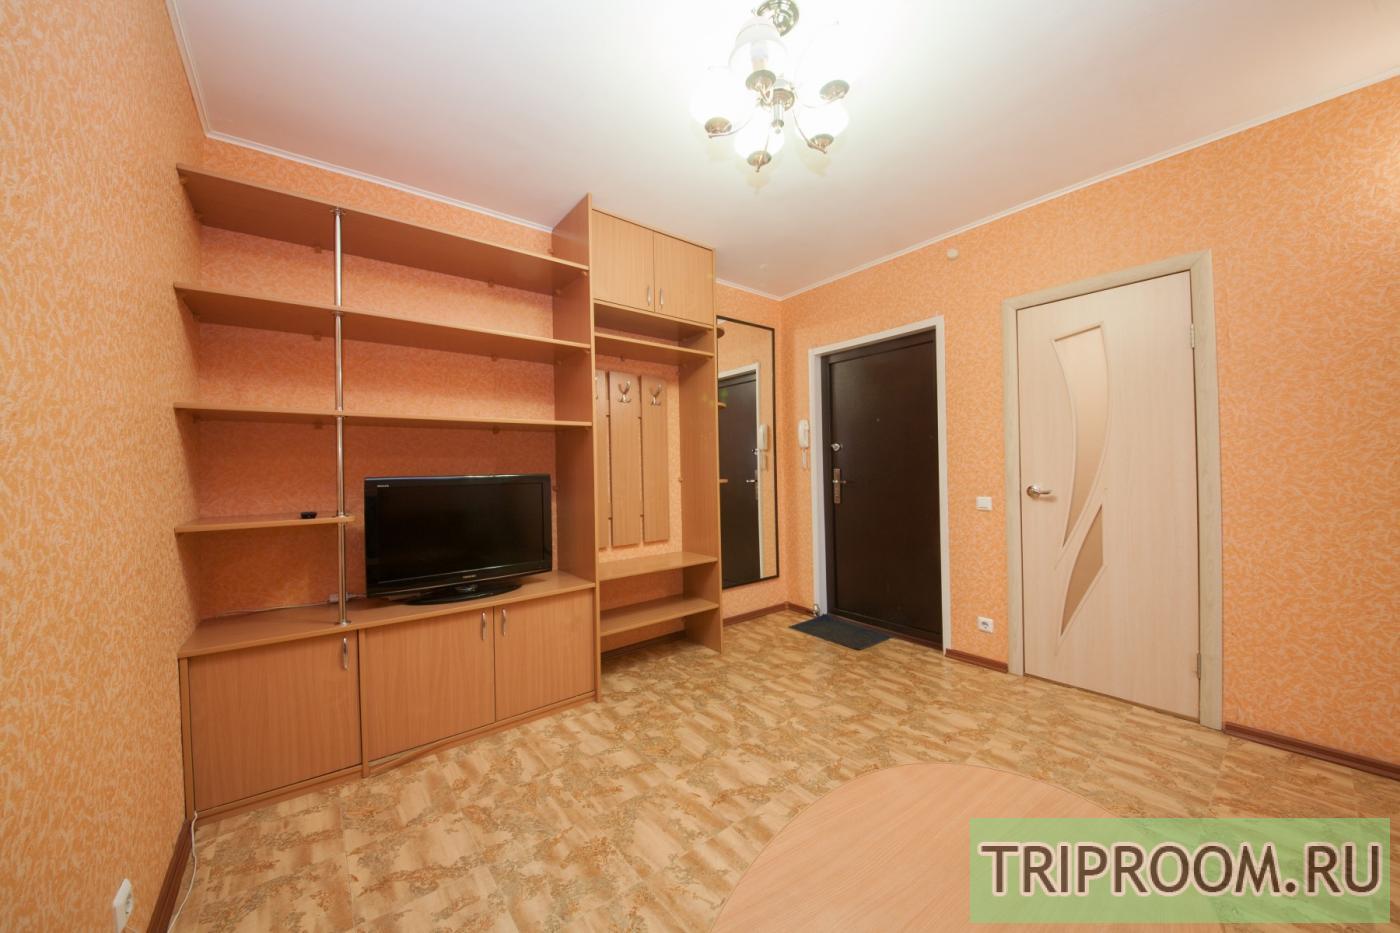 1-комнатная квартира посуточно (вариант № 35185), ул. Алексеева улица, фото № 5